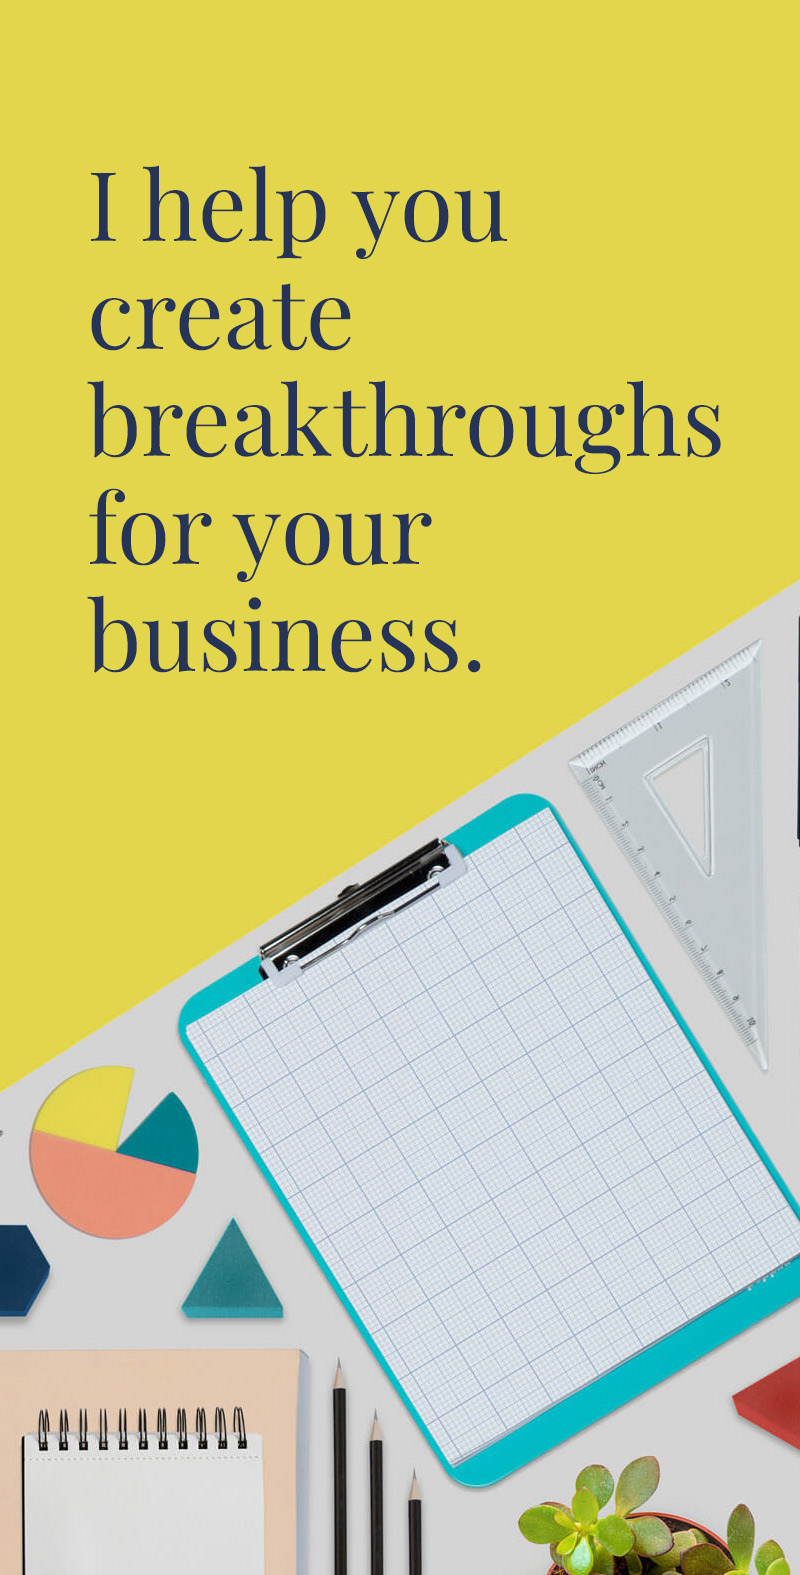 I help you create breakthroughs